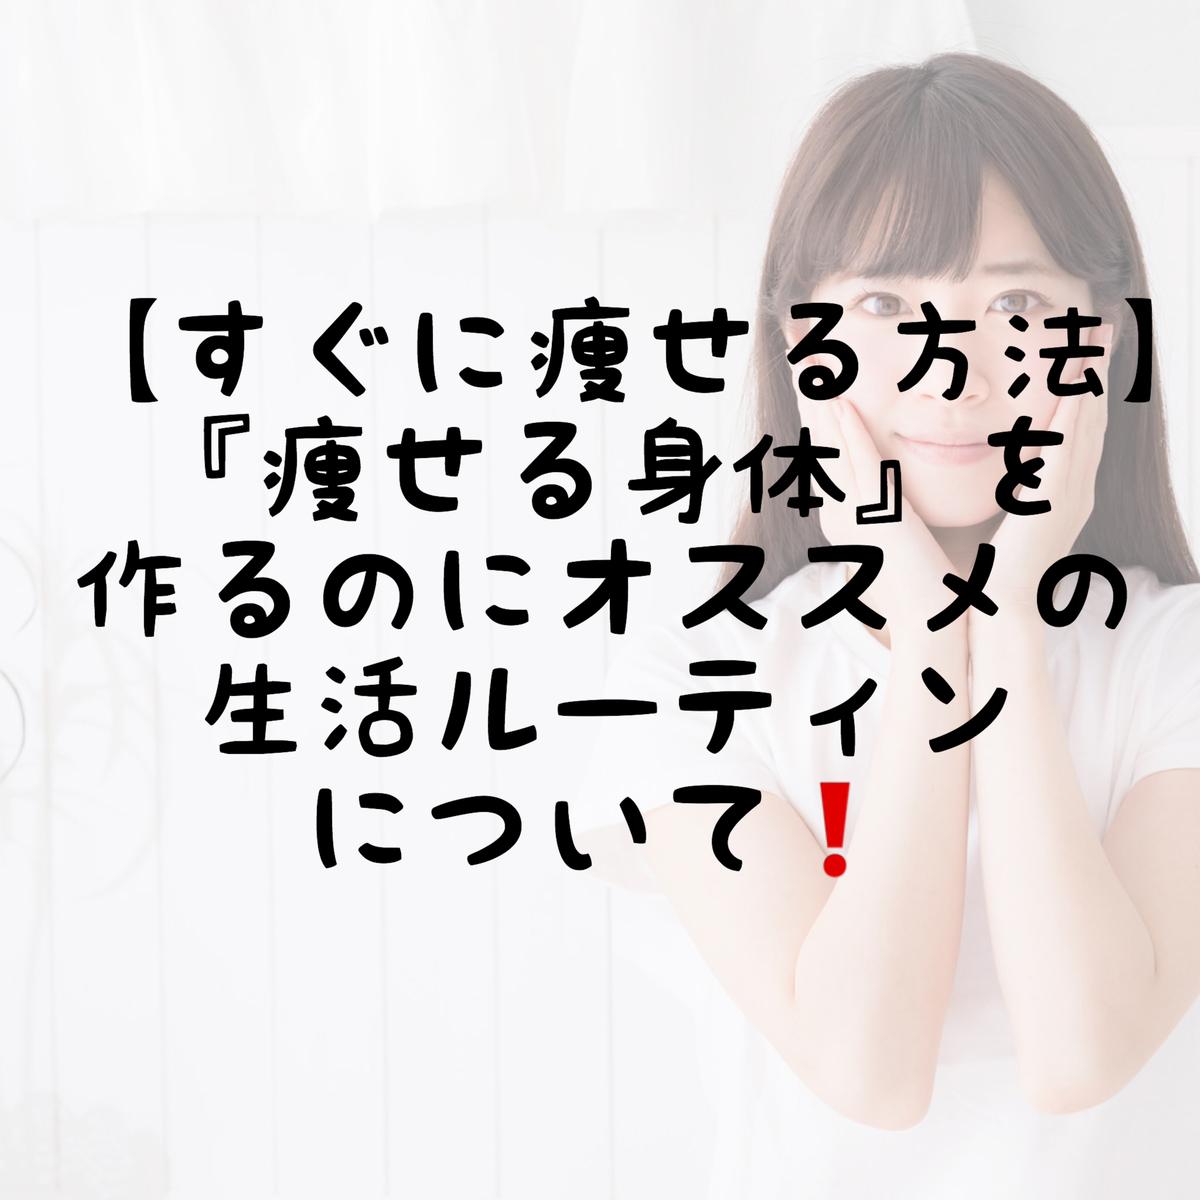 f:id:nokonoko_o:20200526185525j:plain